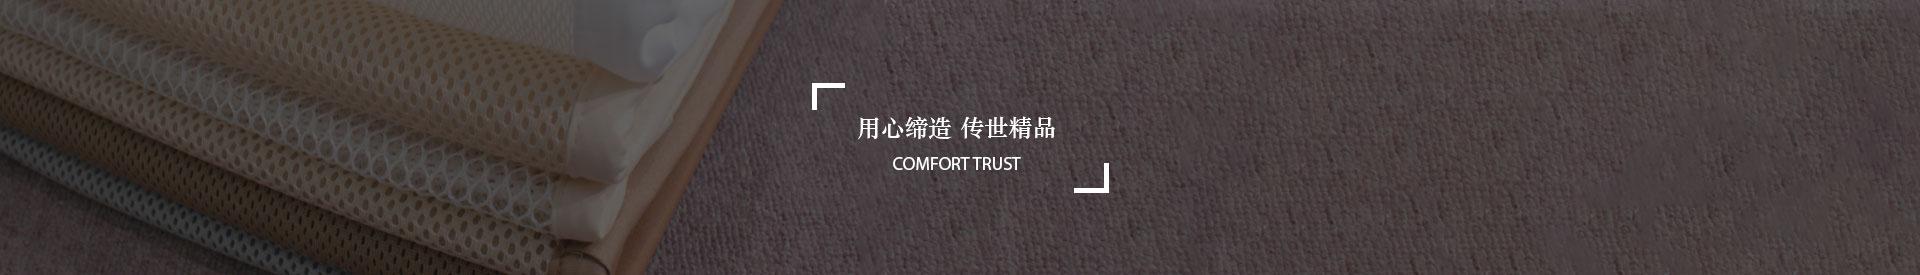 通用内页banner